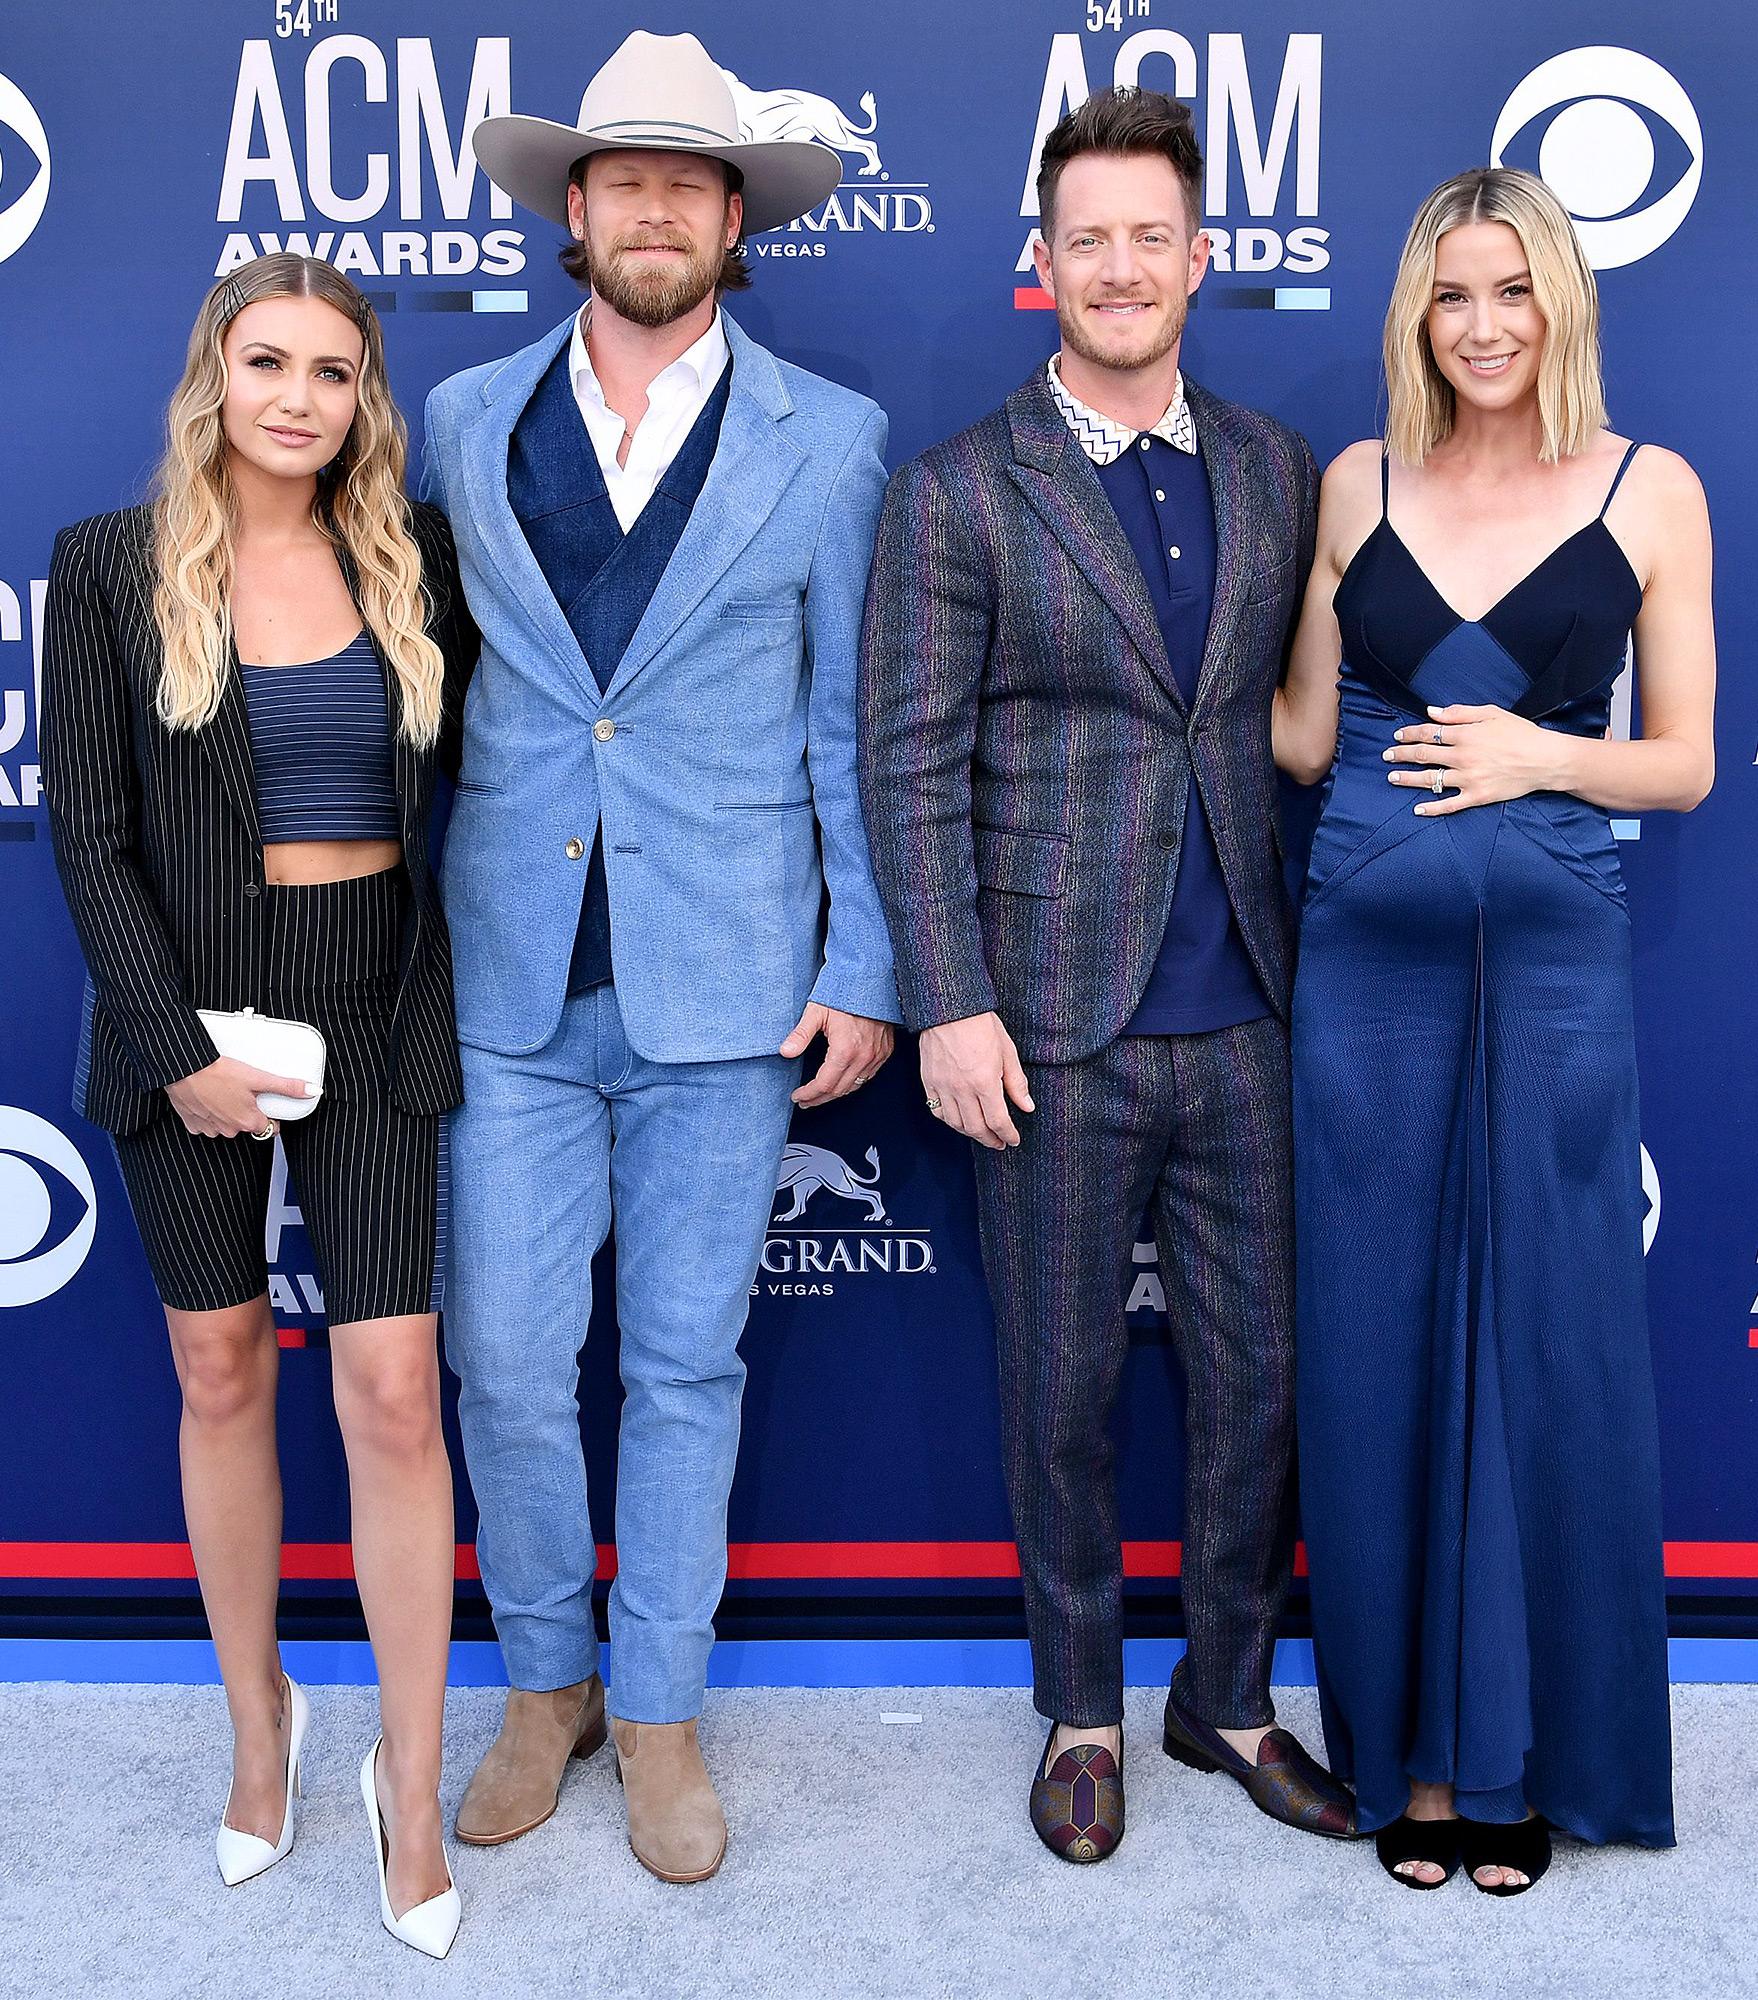 54th Annual ACM Awards, Arrivals, Grand Garden Arena, Las Vegas, USA - 07 Apr 2019